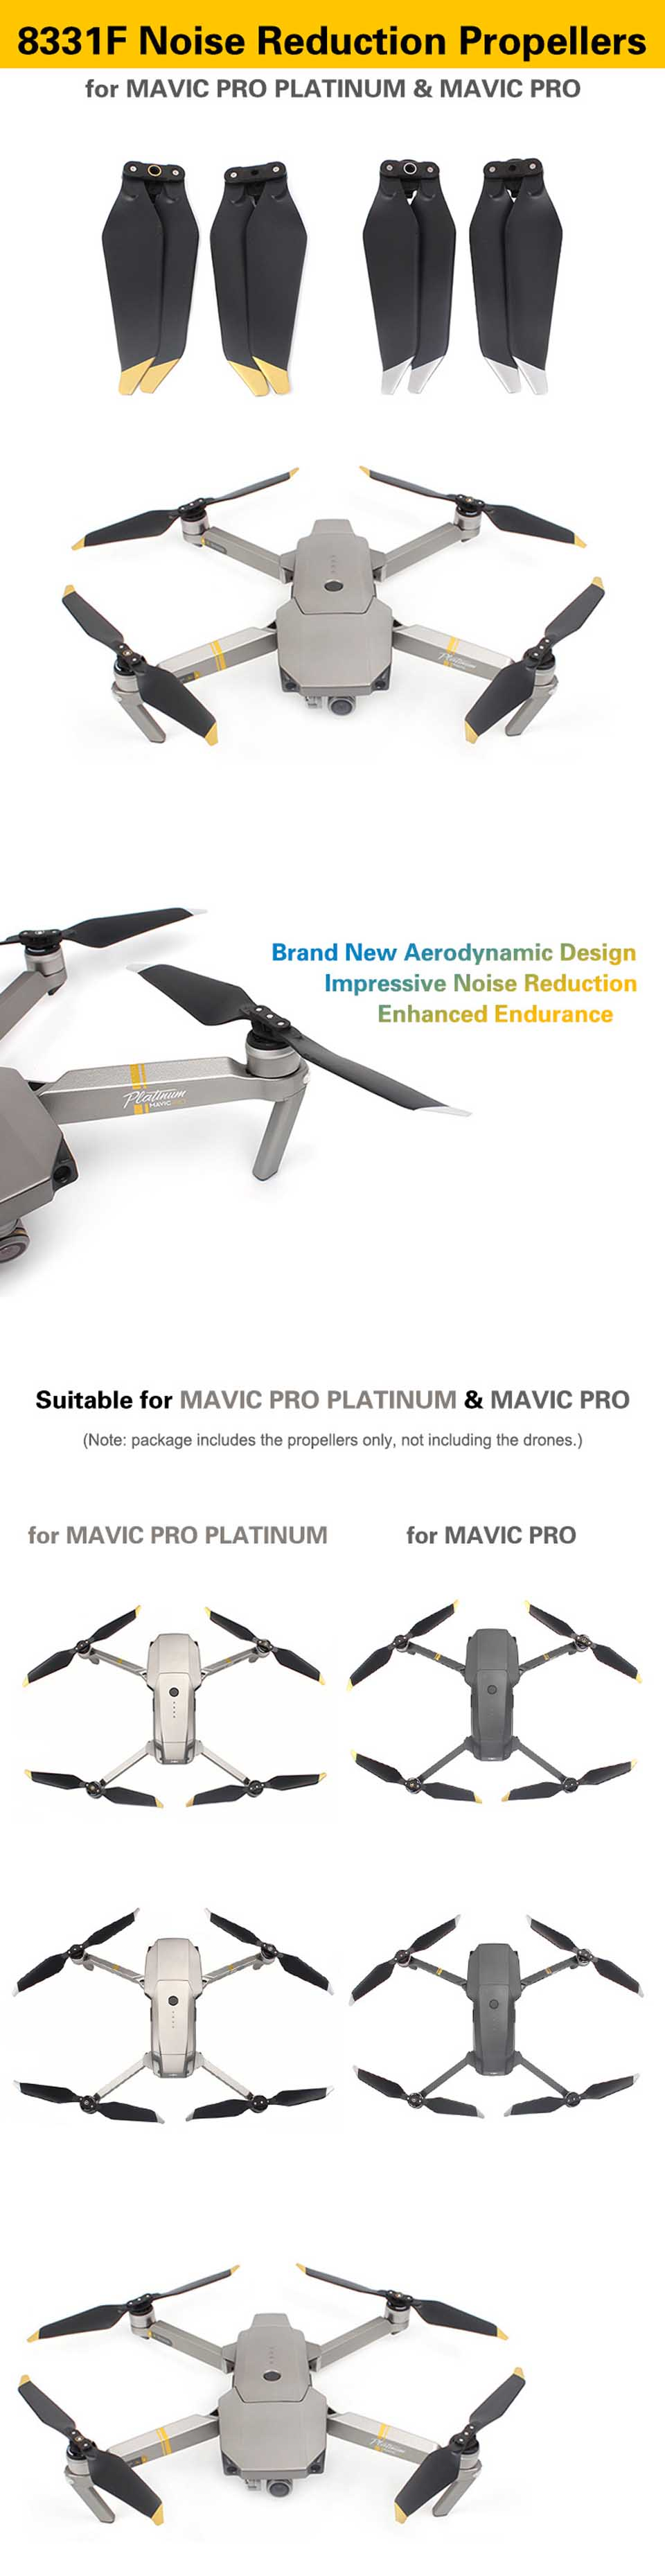 2 Pair DJI Mavic Pro Platinum 8331 Low-Noise Quick-Release Propellers ( Golden ) for Mavic Pro Drone Accessories